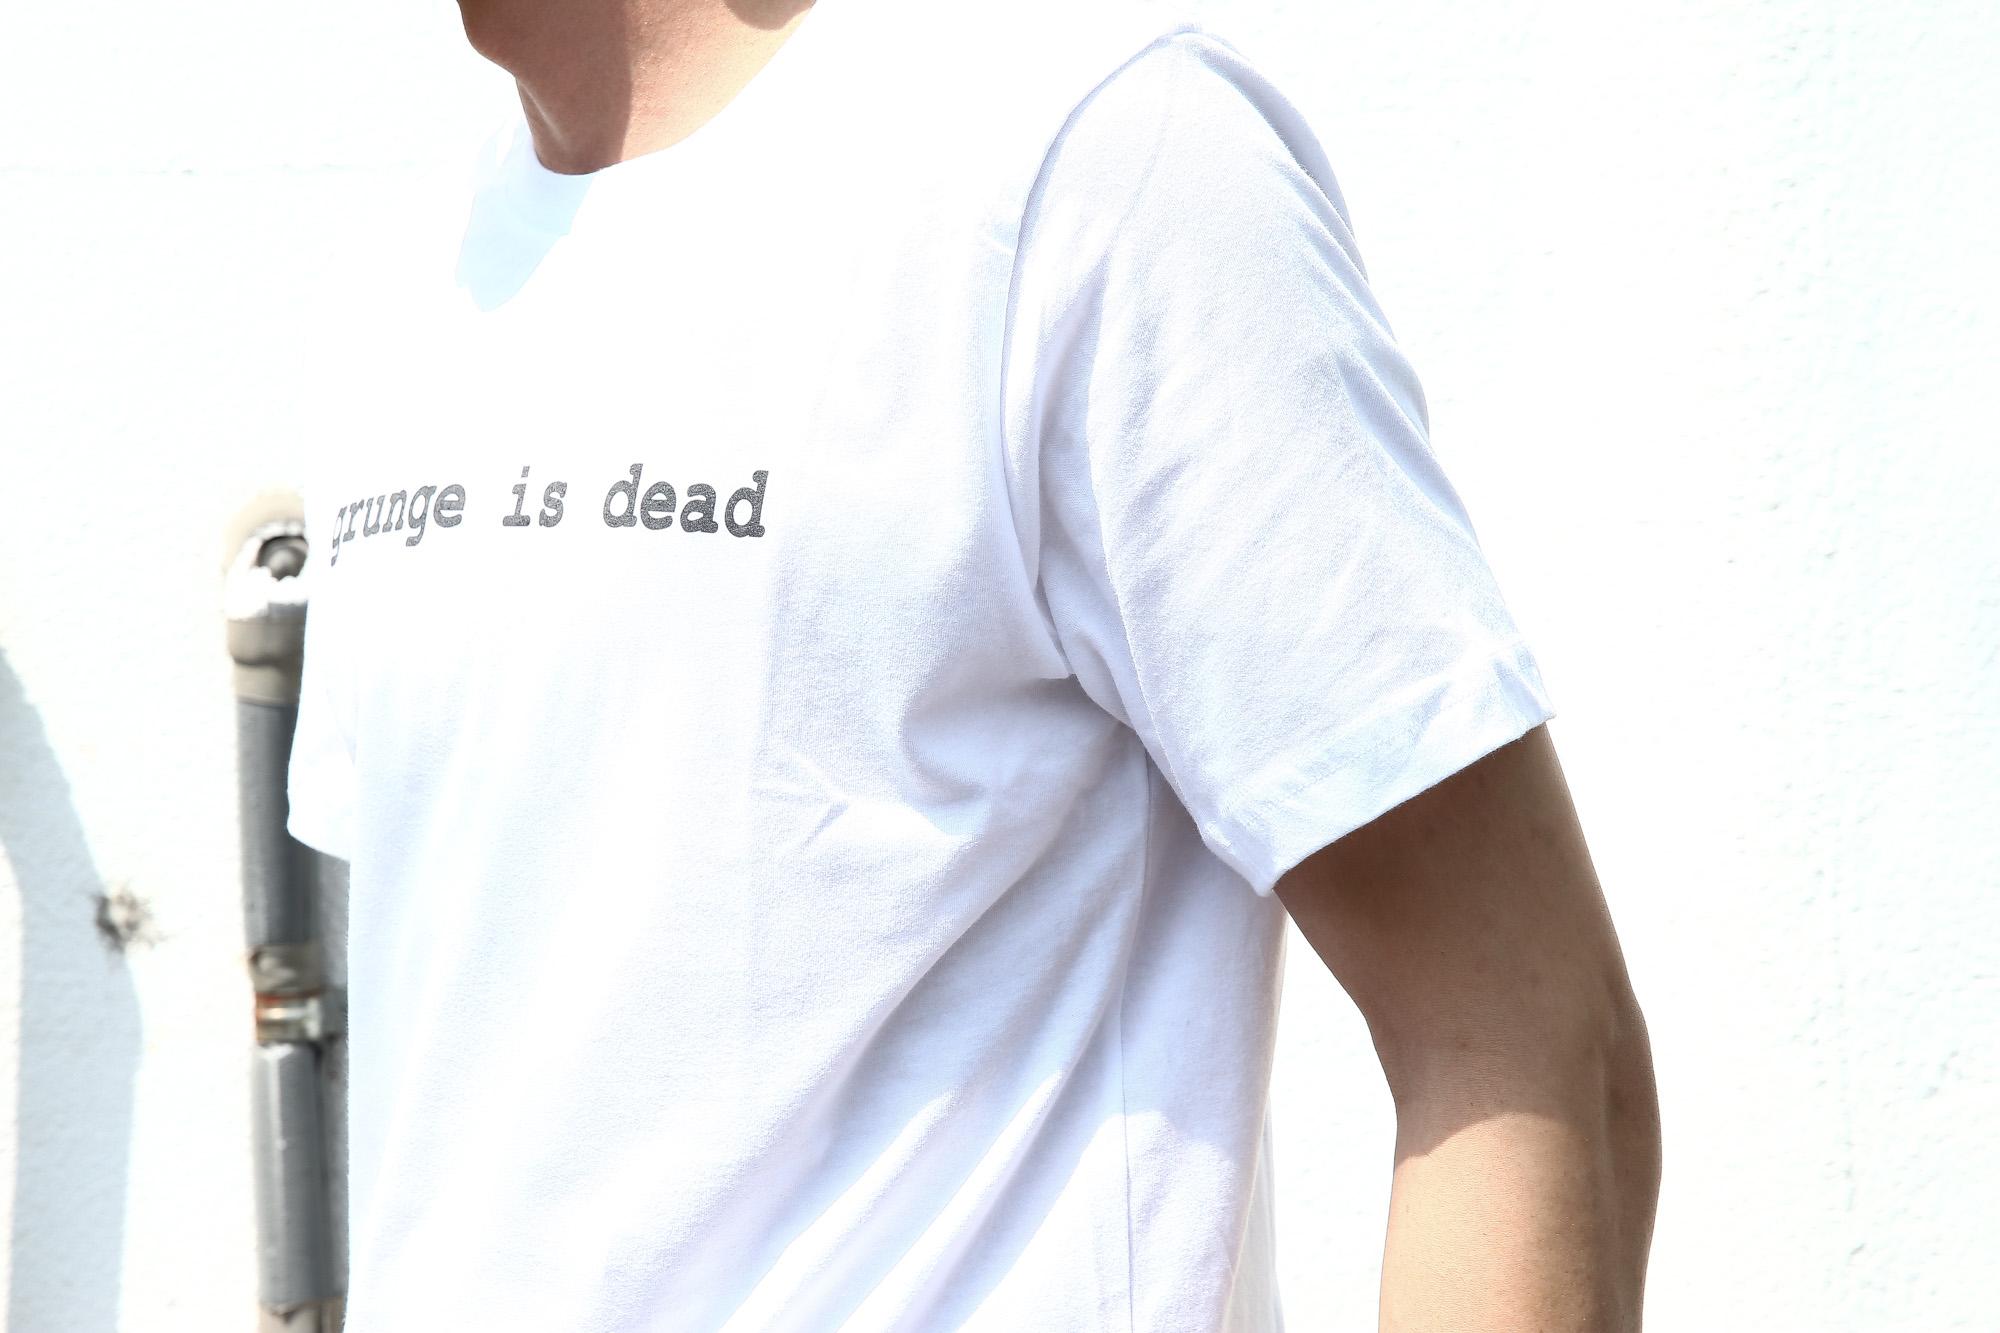 WORN FREE (ウォーンフリー) grunge is dead. Nirvana(ニルヴァーナ) Kurt Cobain(カート・コバーン) 1992 NEW YORK プリントTシャツ バンドTシャツ  ロックTシャツ WHITE(ホワイト) MADE IN USA (アメリカ製) 2018春夏新作 wornfree ウォーンフリー 愛知 名古屋 ZODIAC ゾディアック